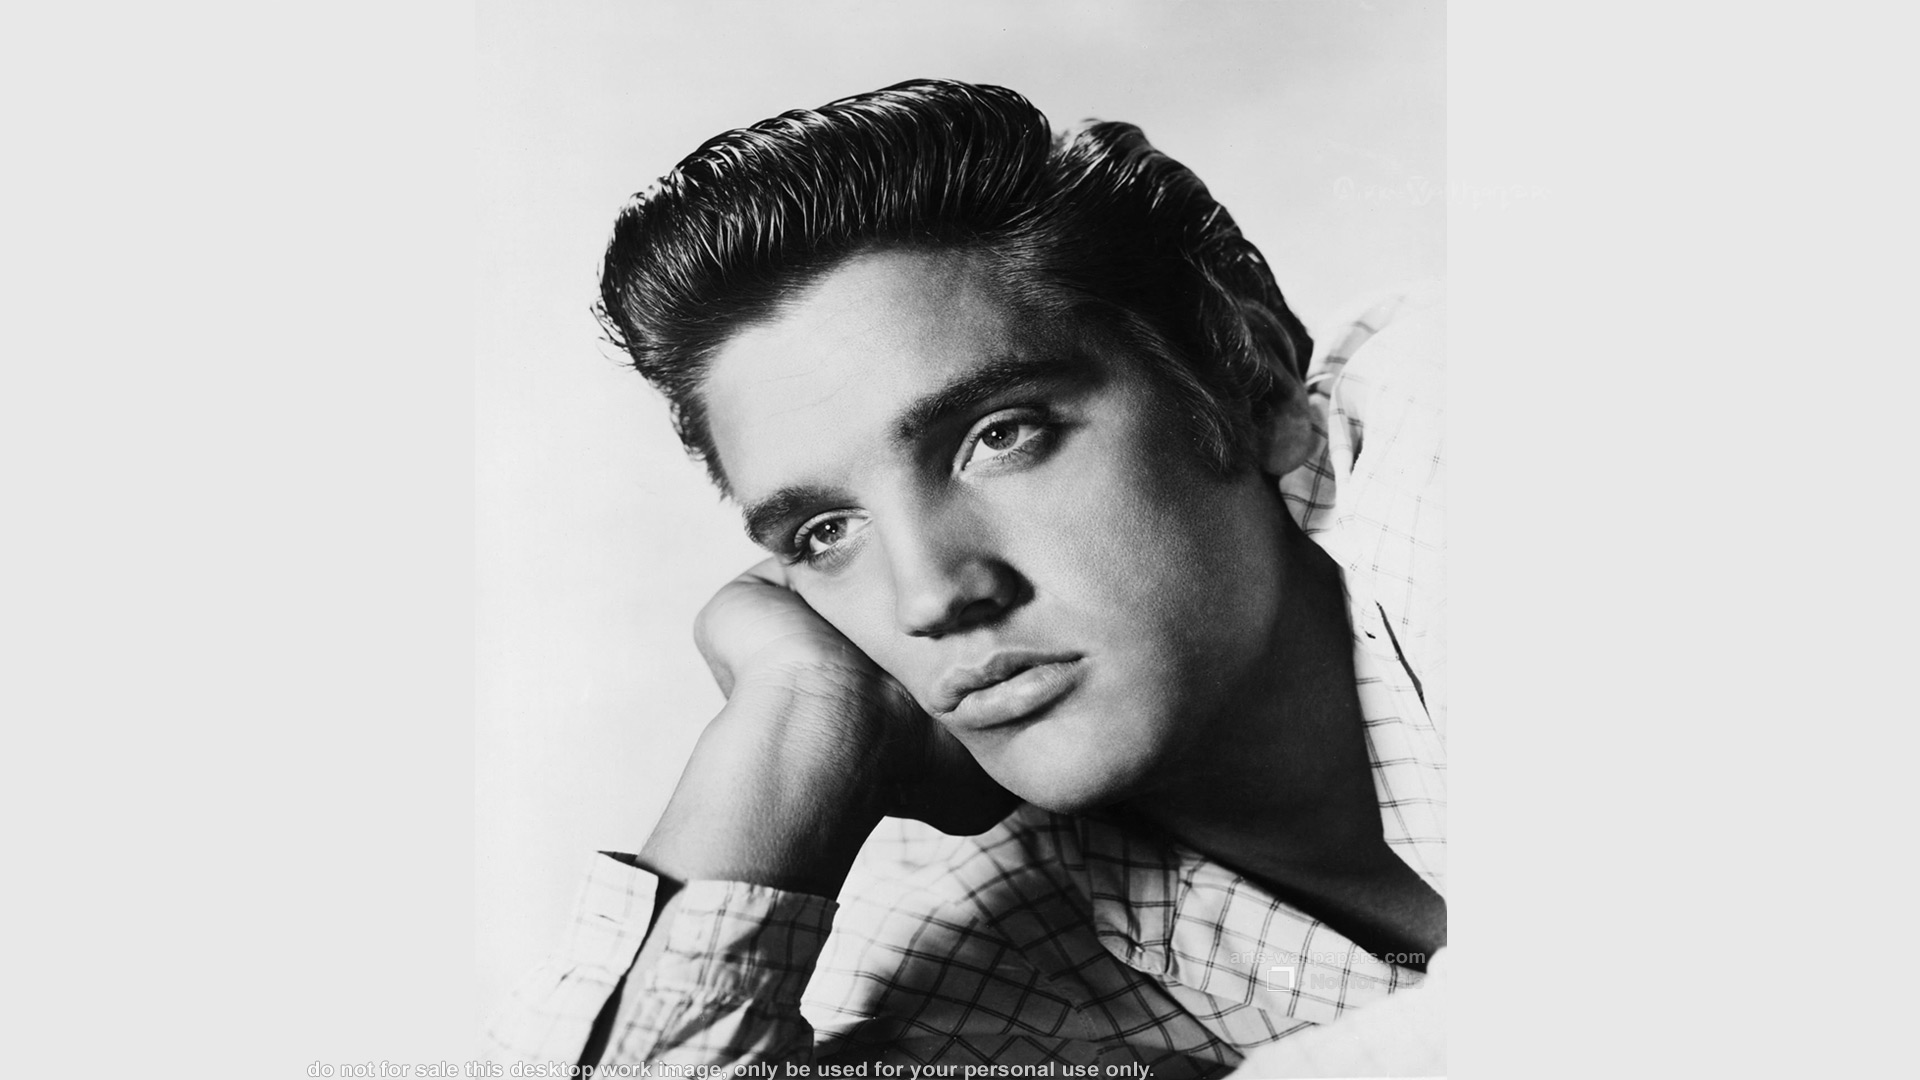 Free Elvis background image